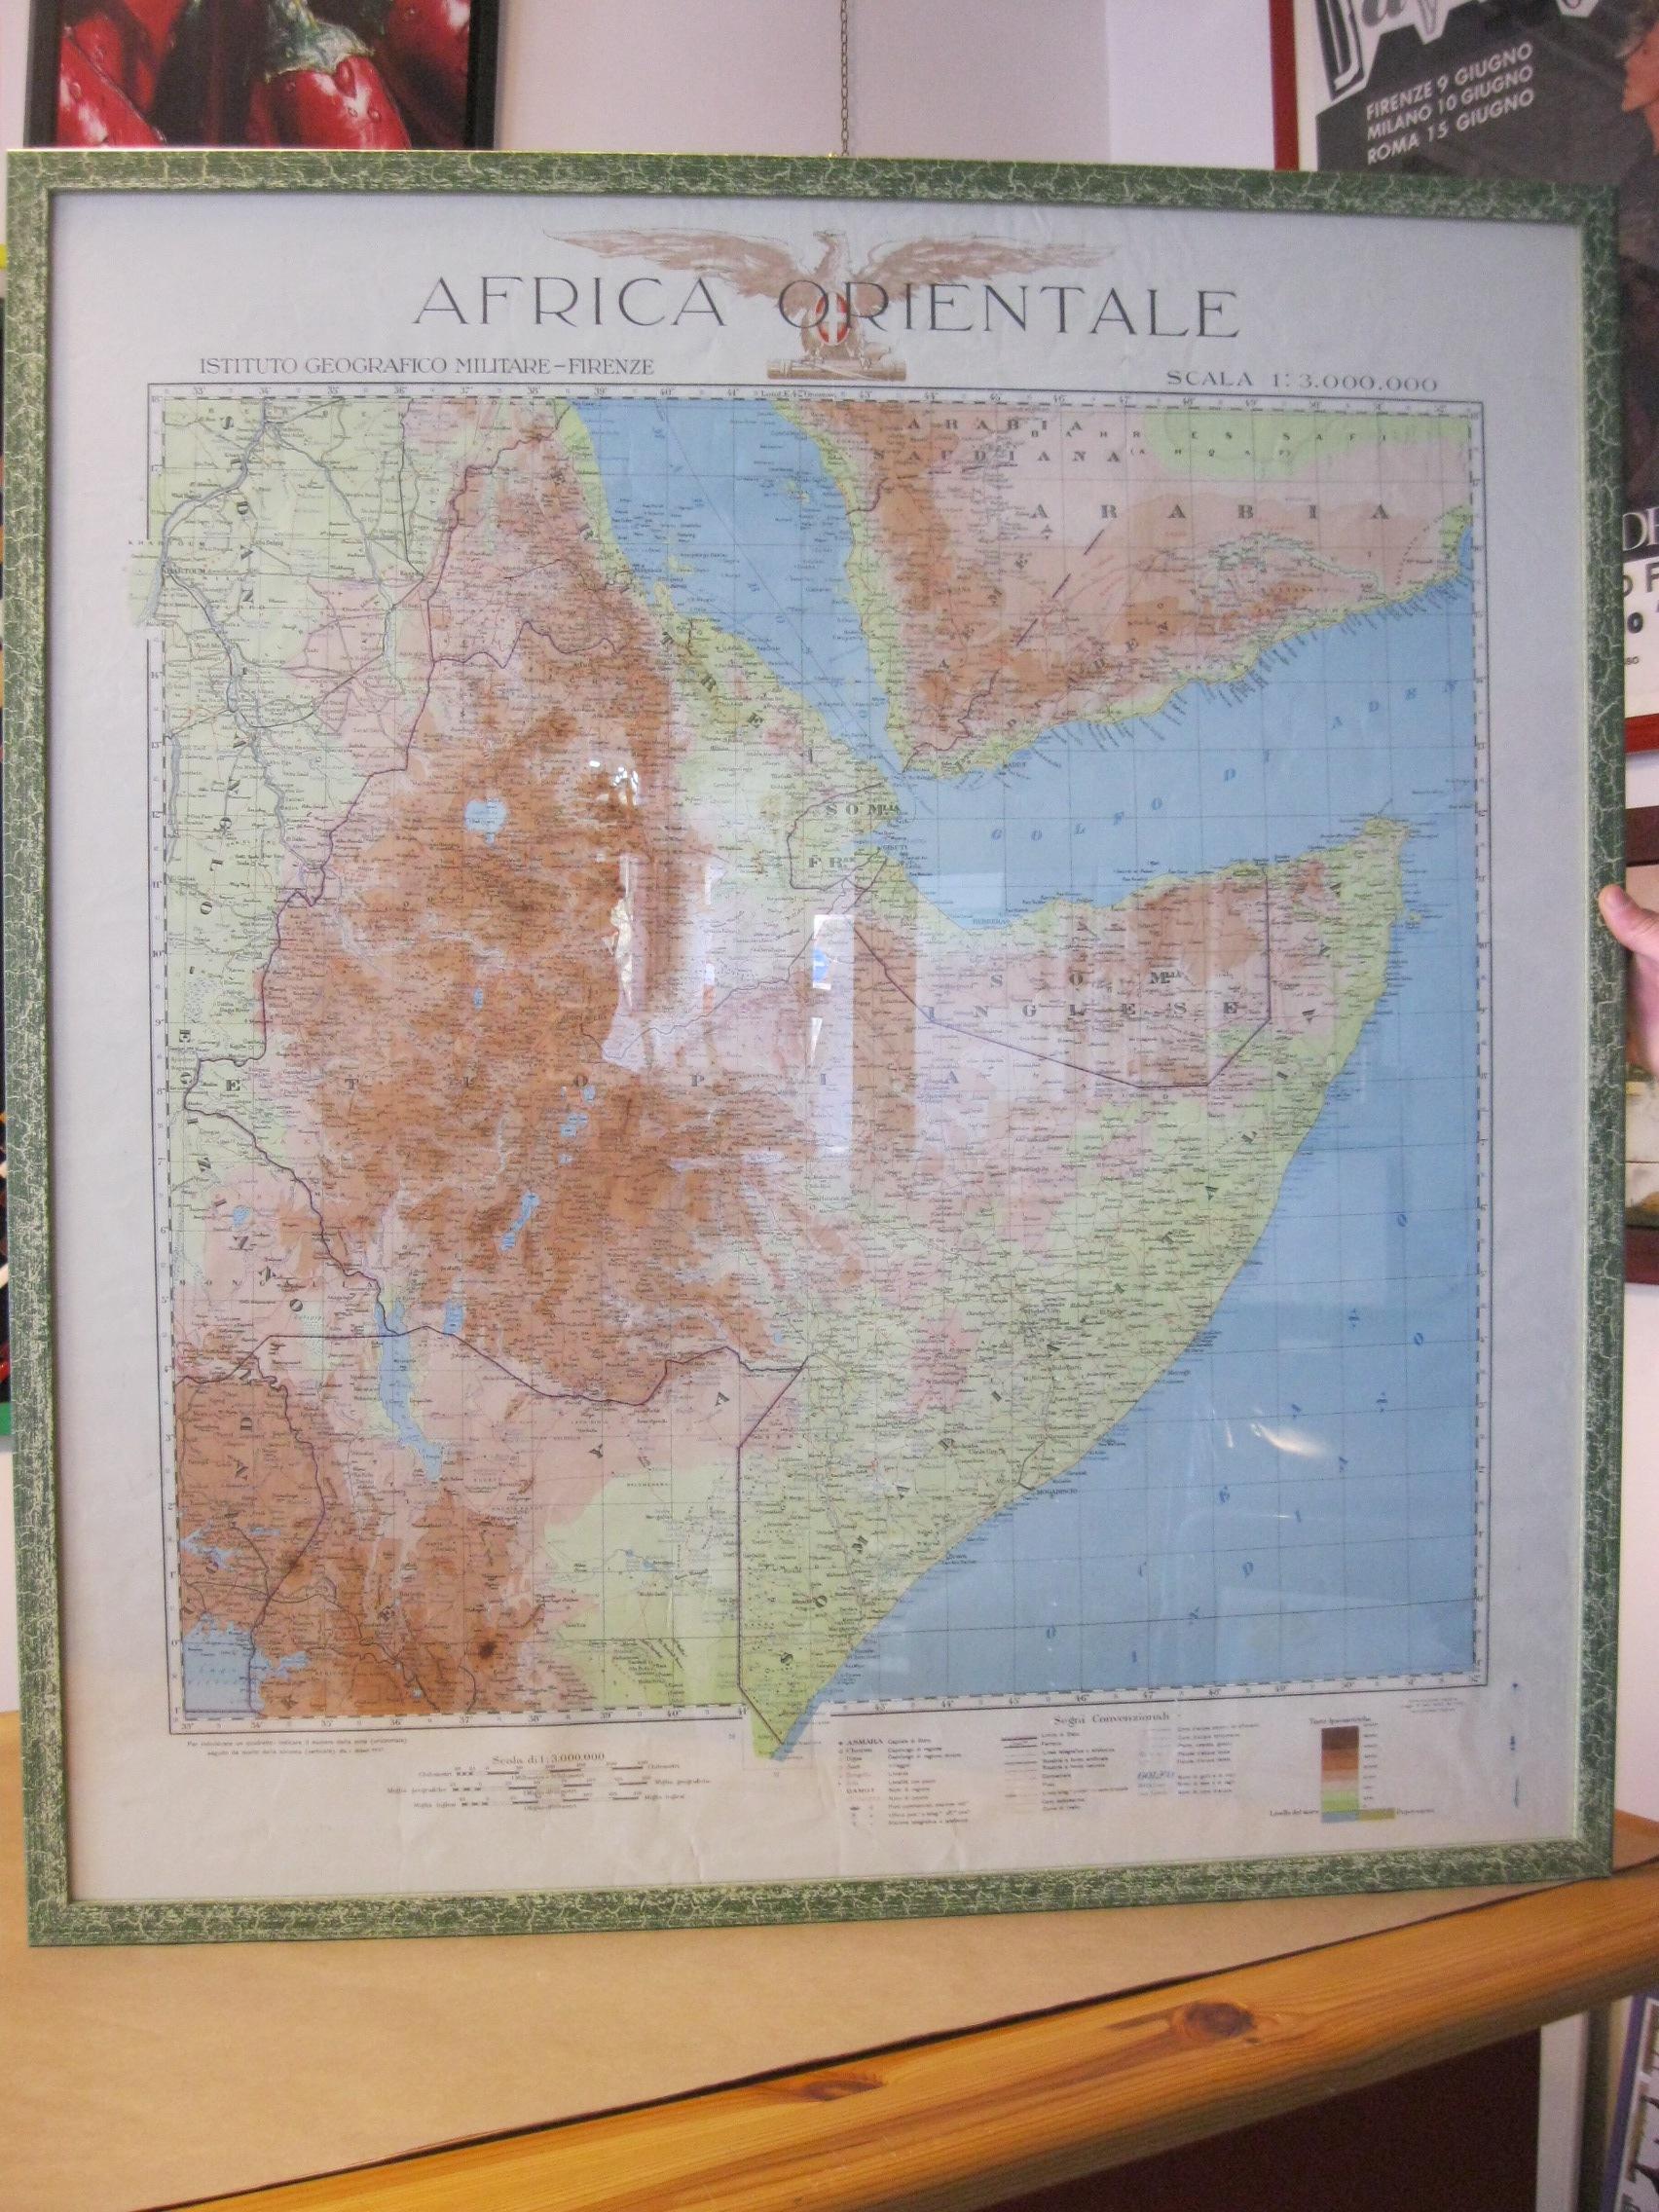 Cartina Geografica Italia Africa.Cartaceo Grande Cartina Geografica Africa Orientale Italiana